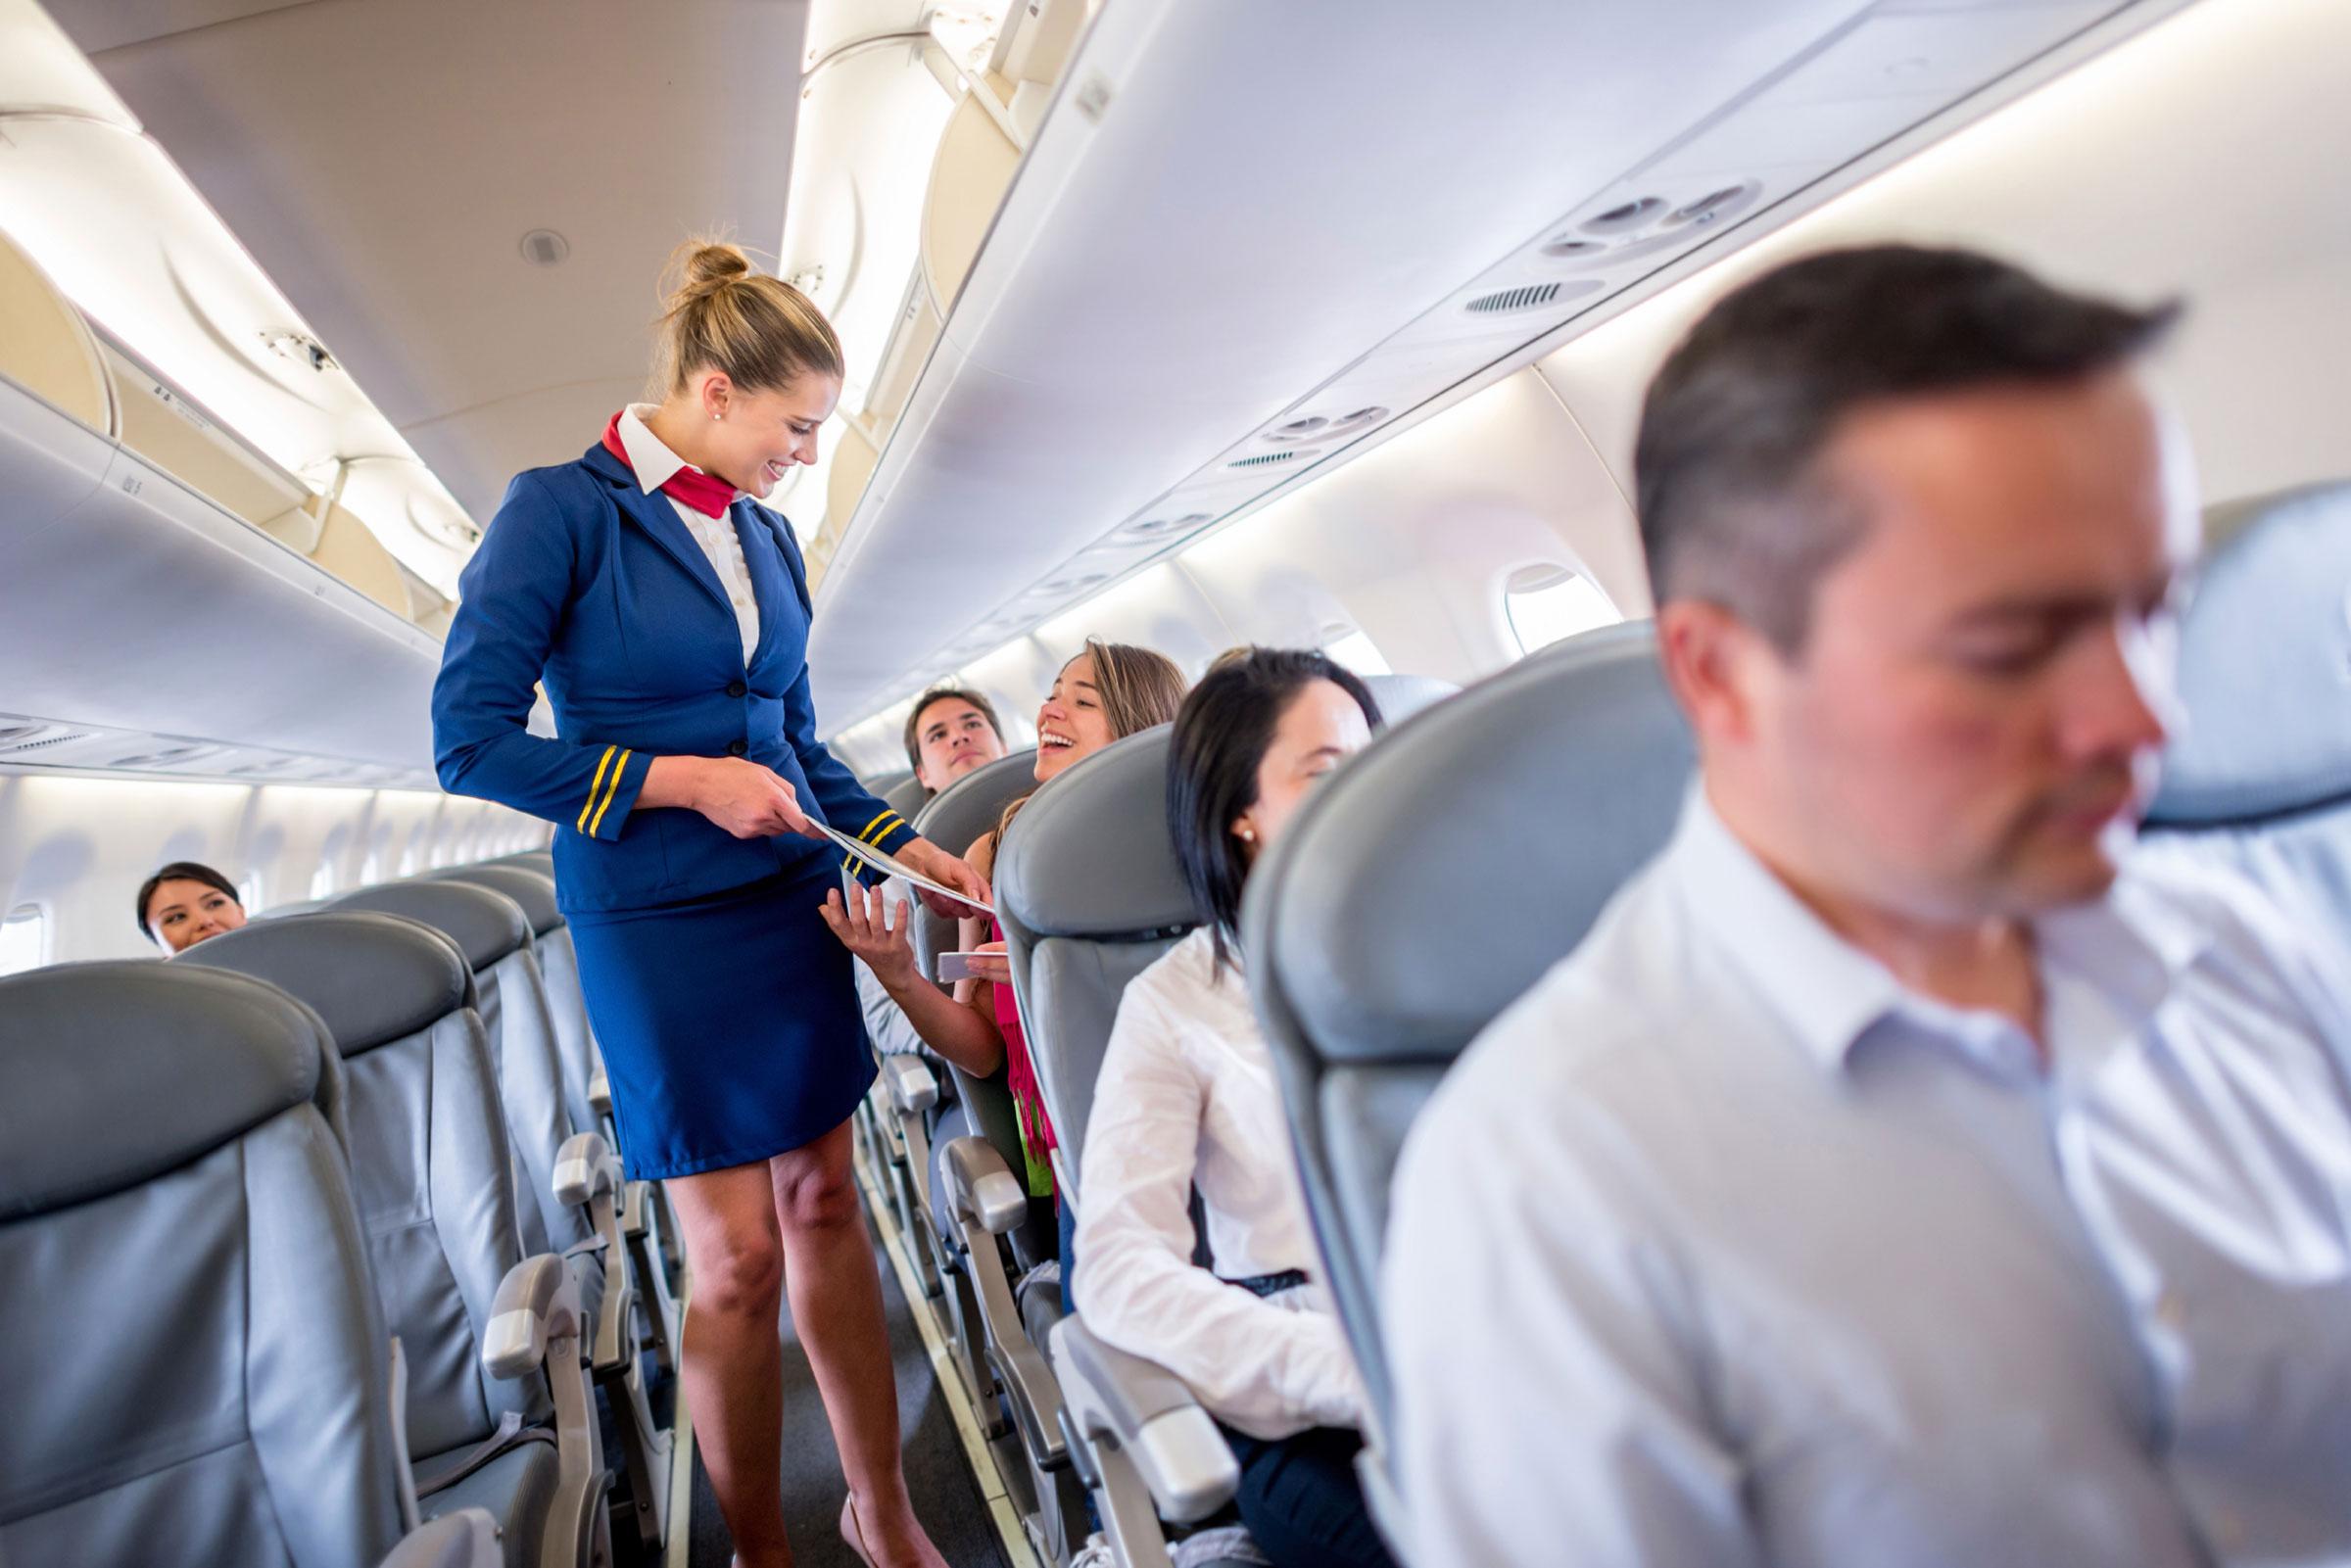 sicurezza dei passeggeri